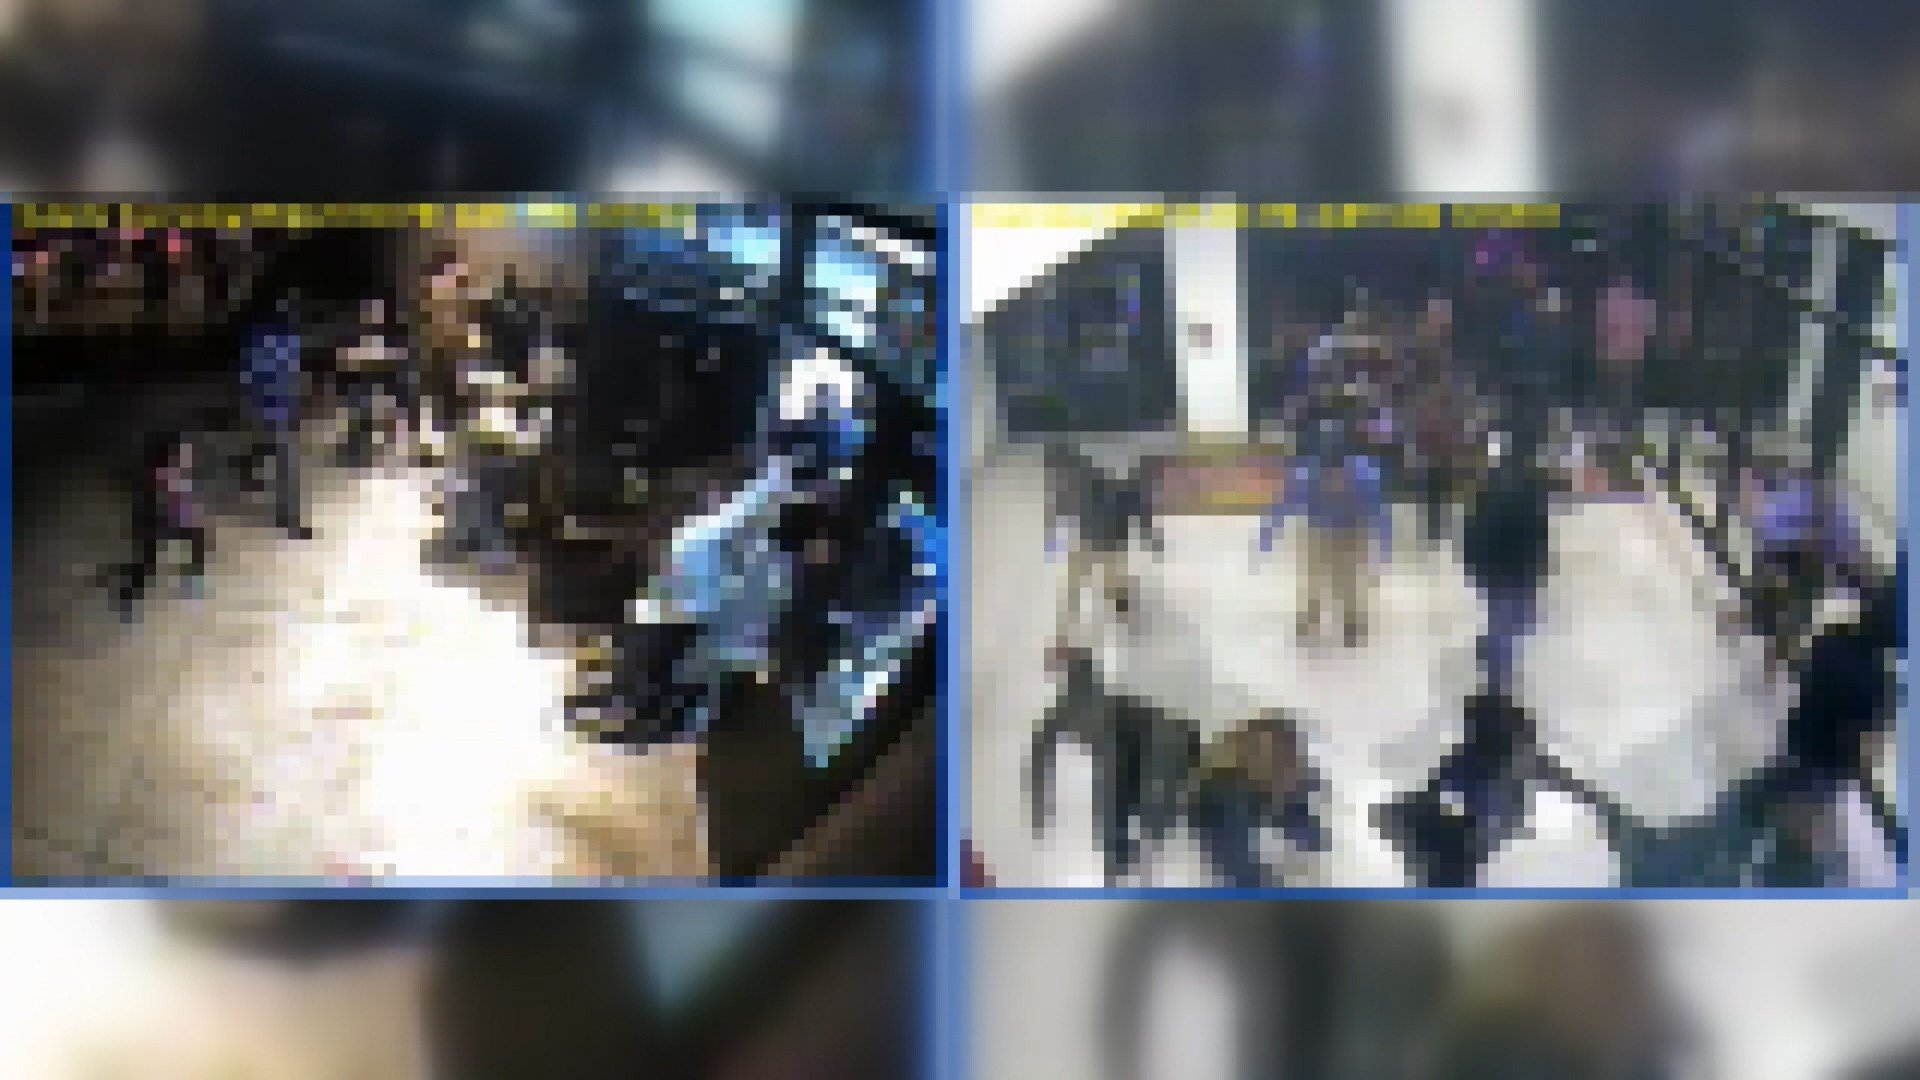 Still from South Aiken High School shooting surveillance footage (source: South Aiken High School)